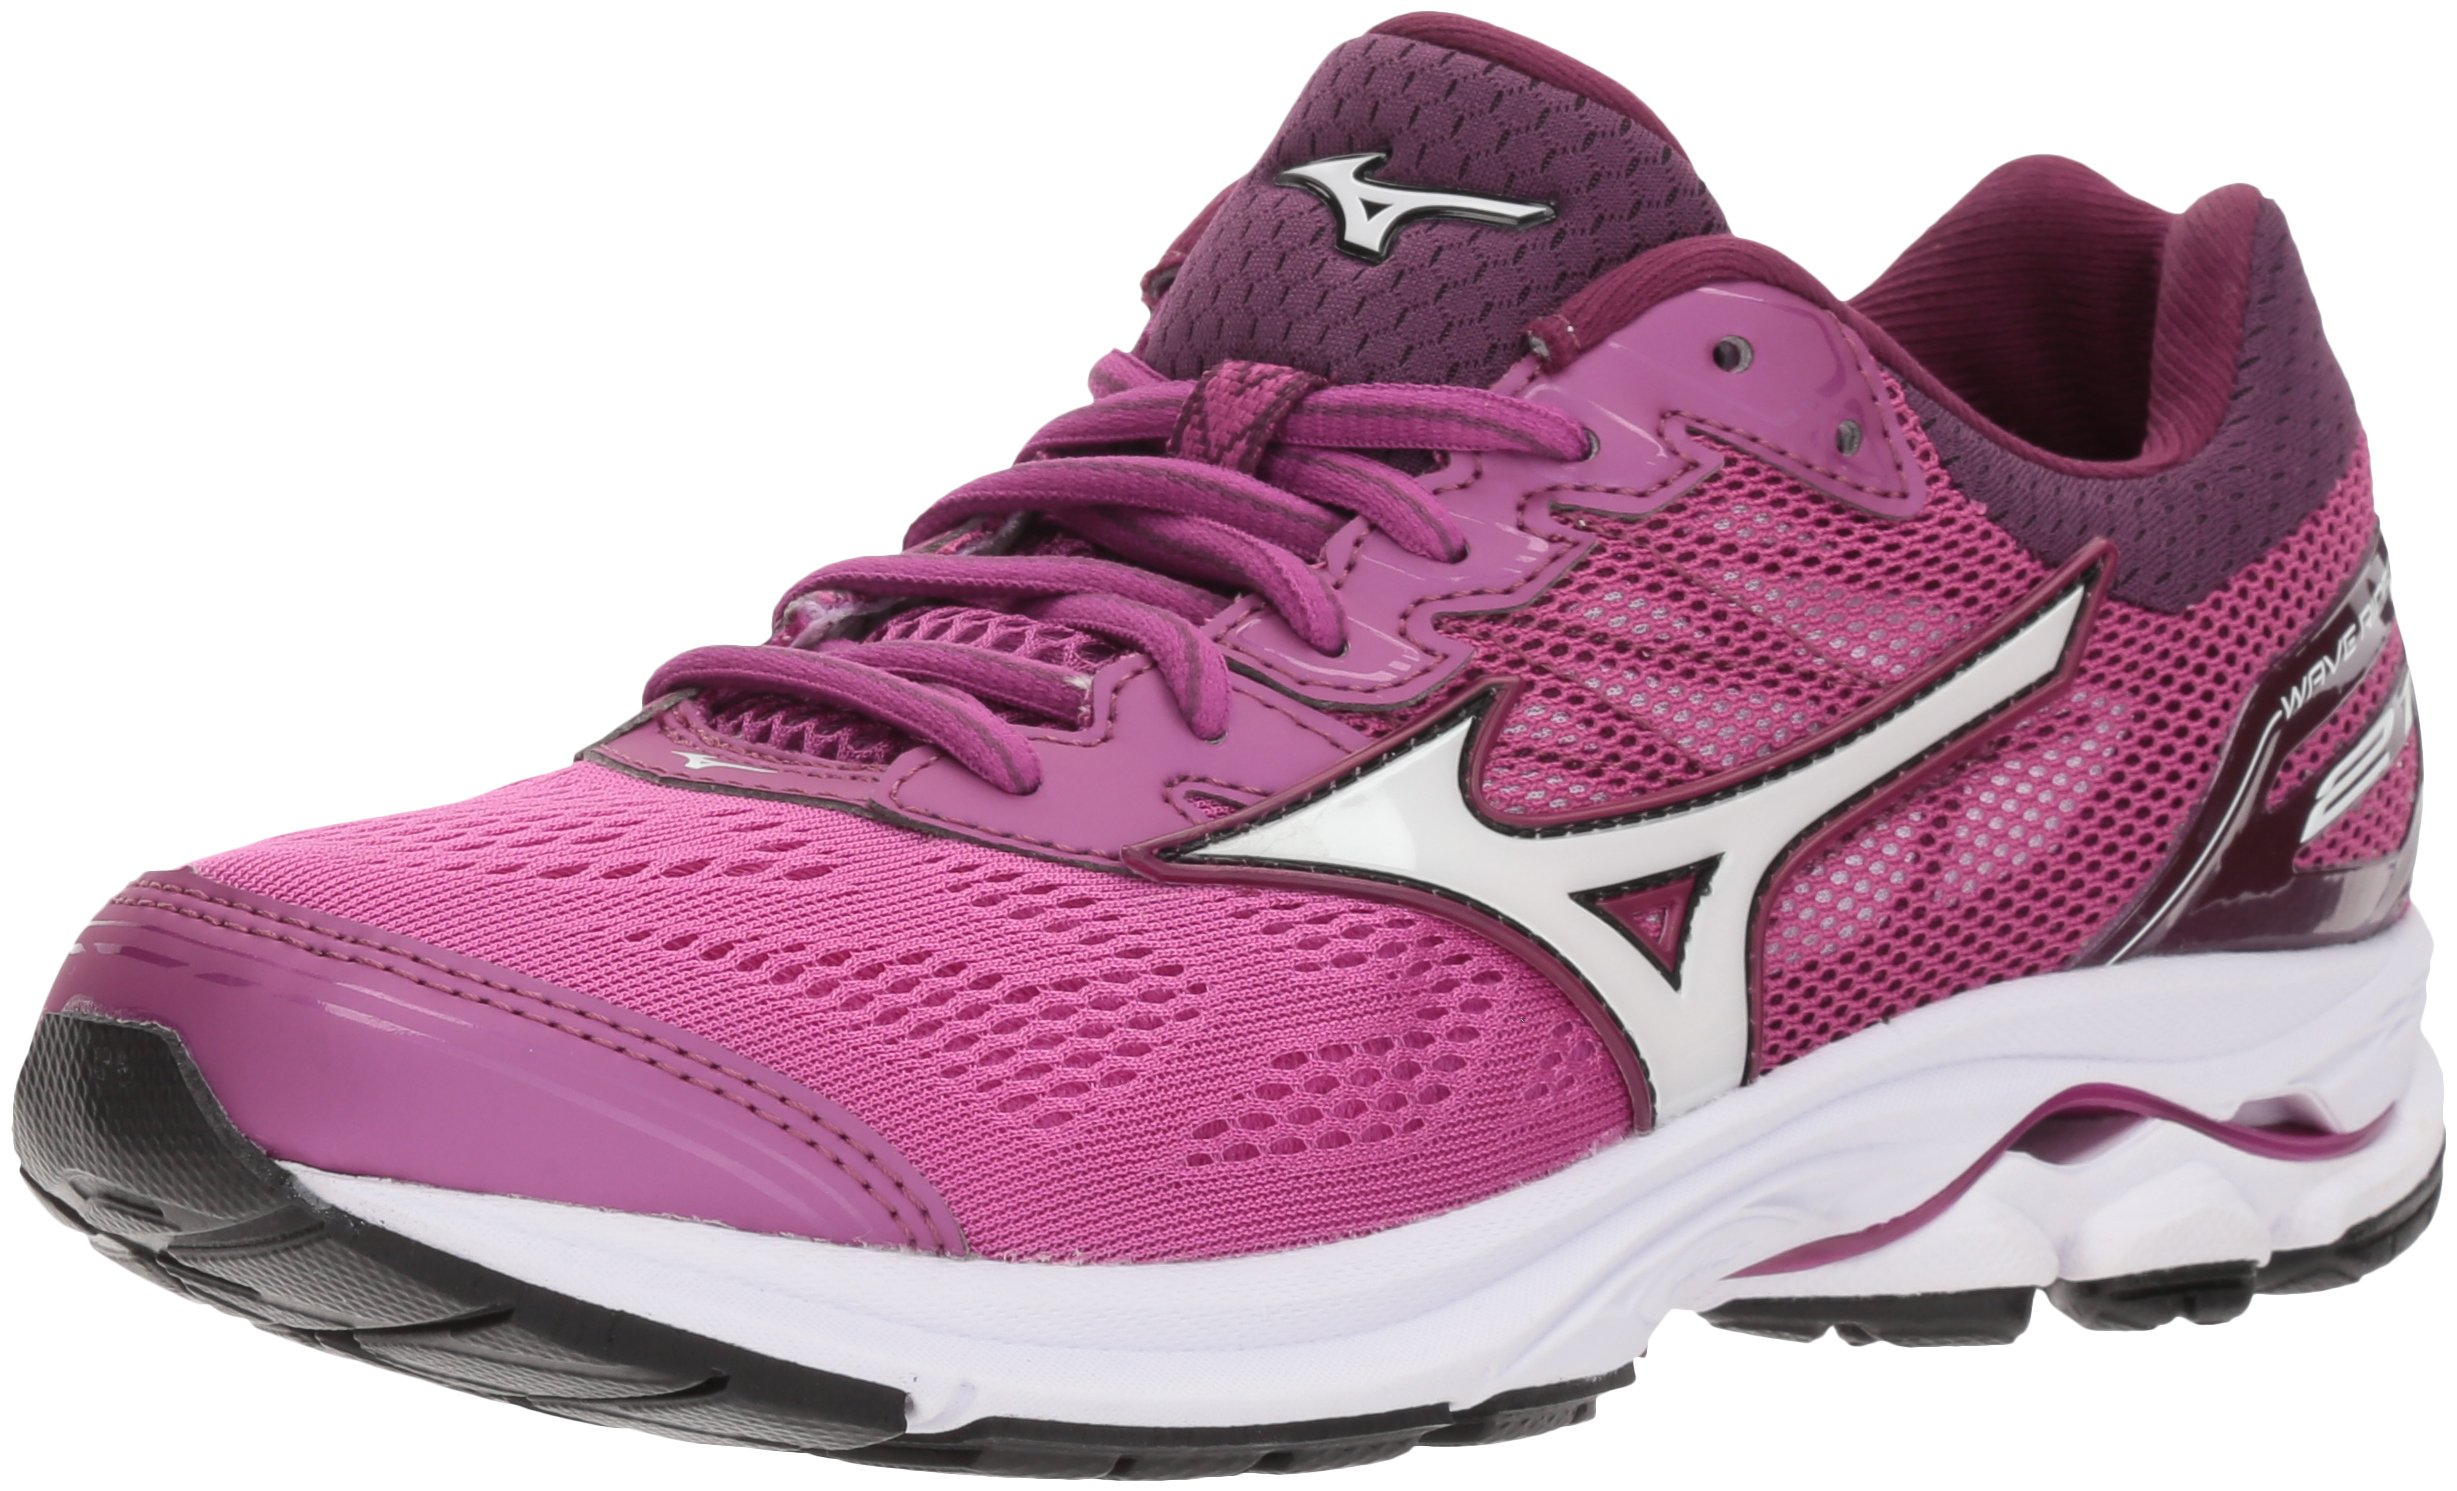 Mizuno Women's Wave Rider 21 Running Shoe Athletic Shoe, Clover/White, 8 B US